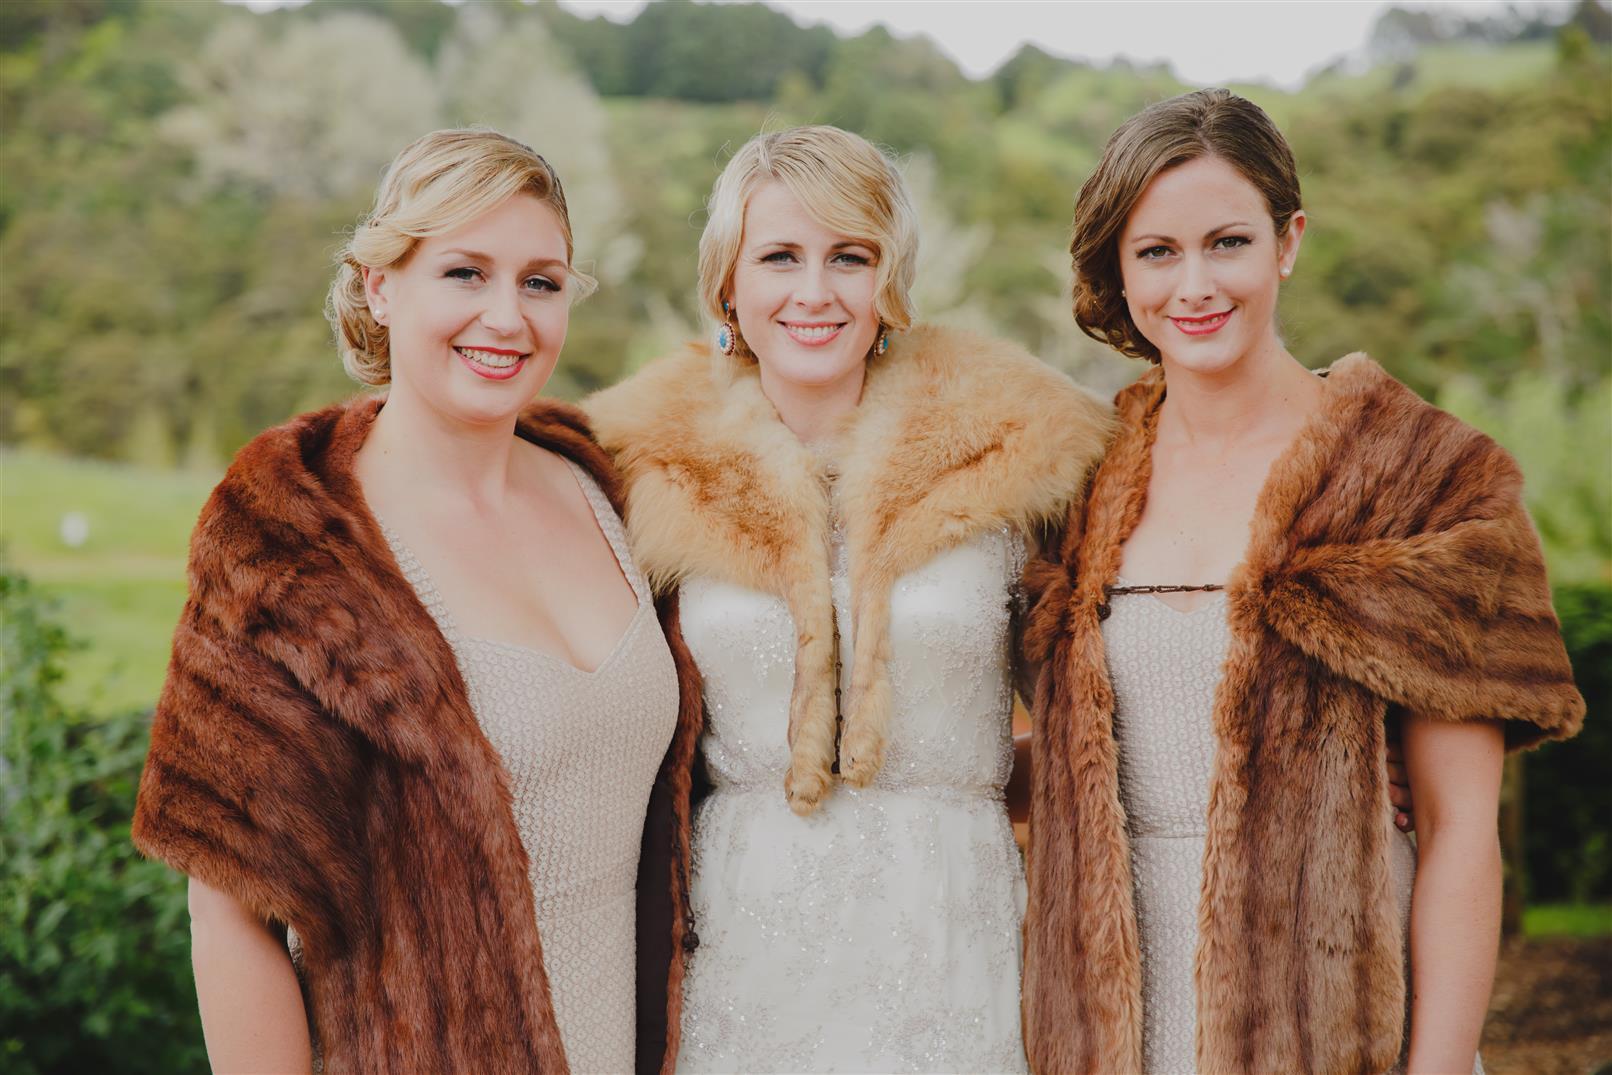 Vintage Bridesmaids - An Elegant Spring Vintage Wedding